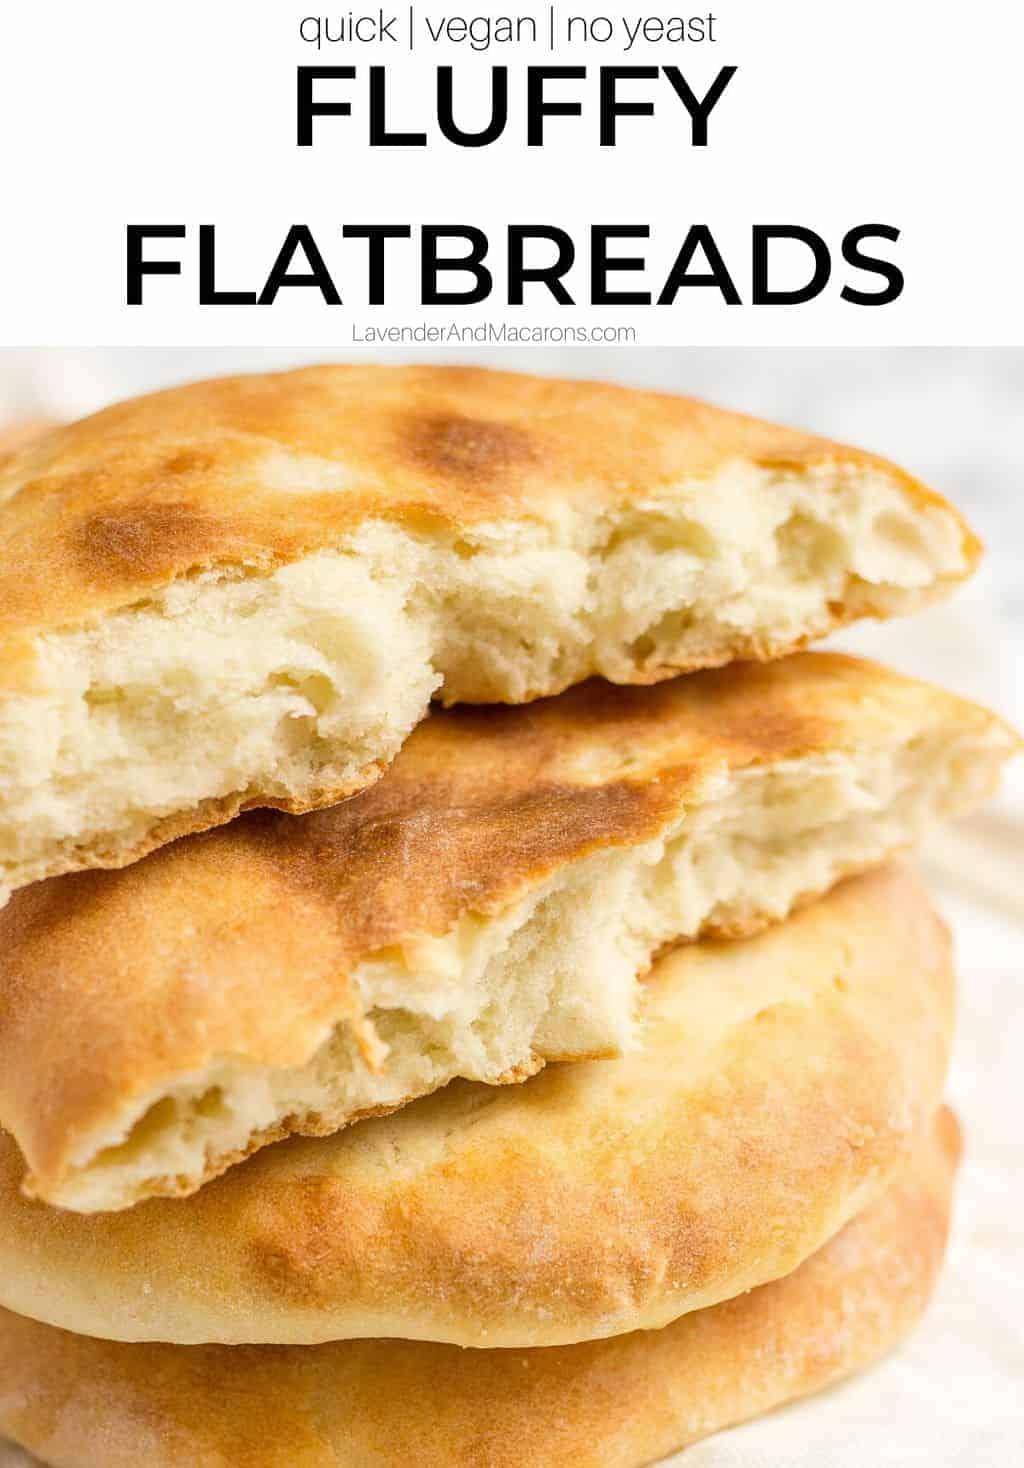 Pinterest image of Georgian flatbreads